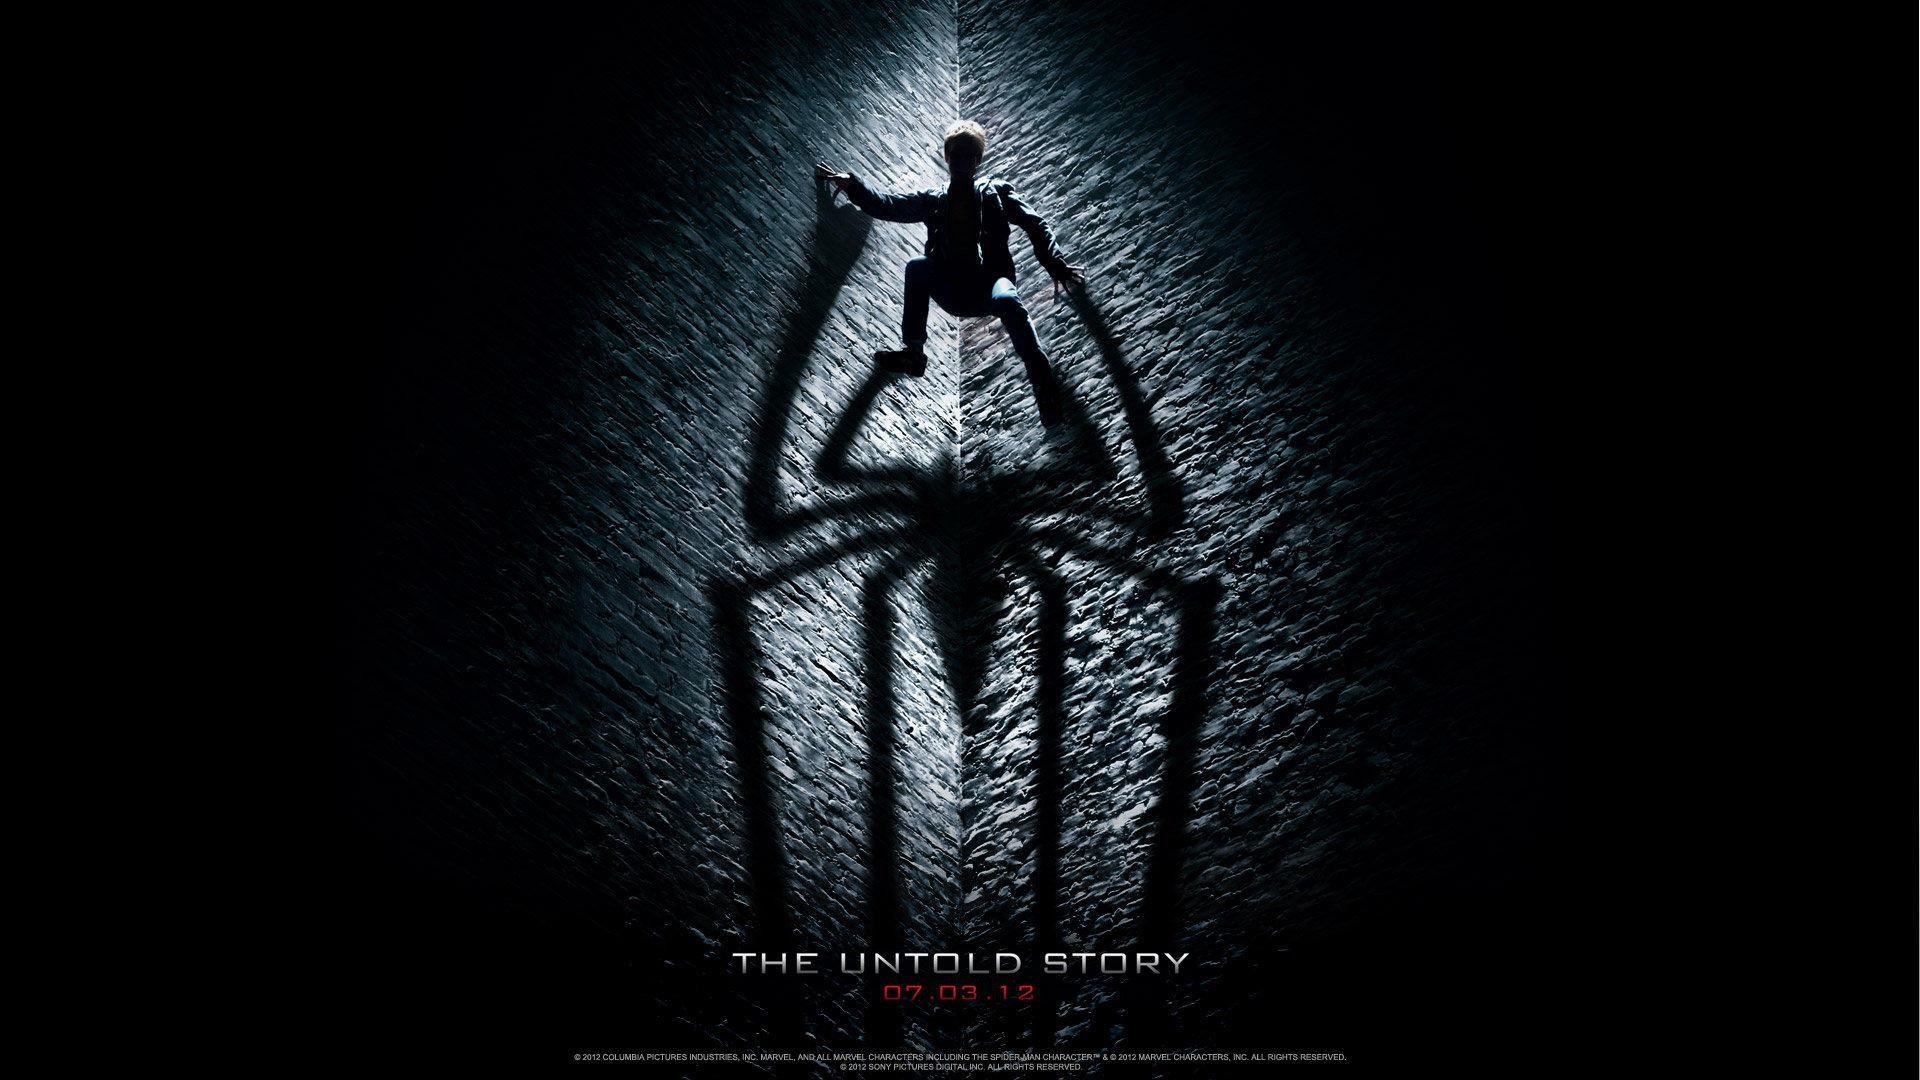 Spiderman Wallpaper for Desktop